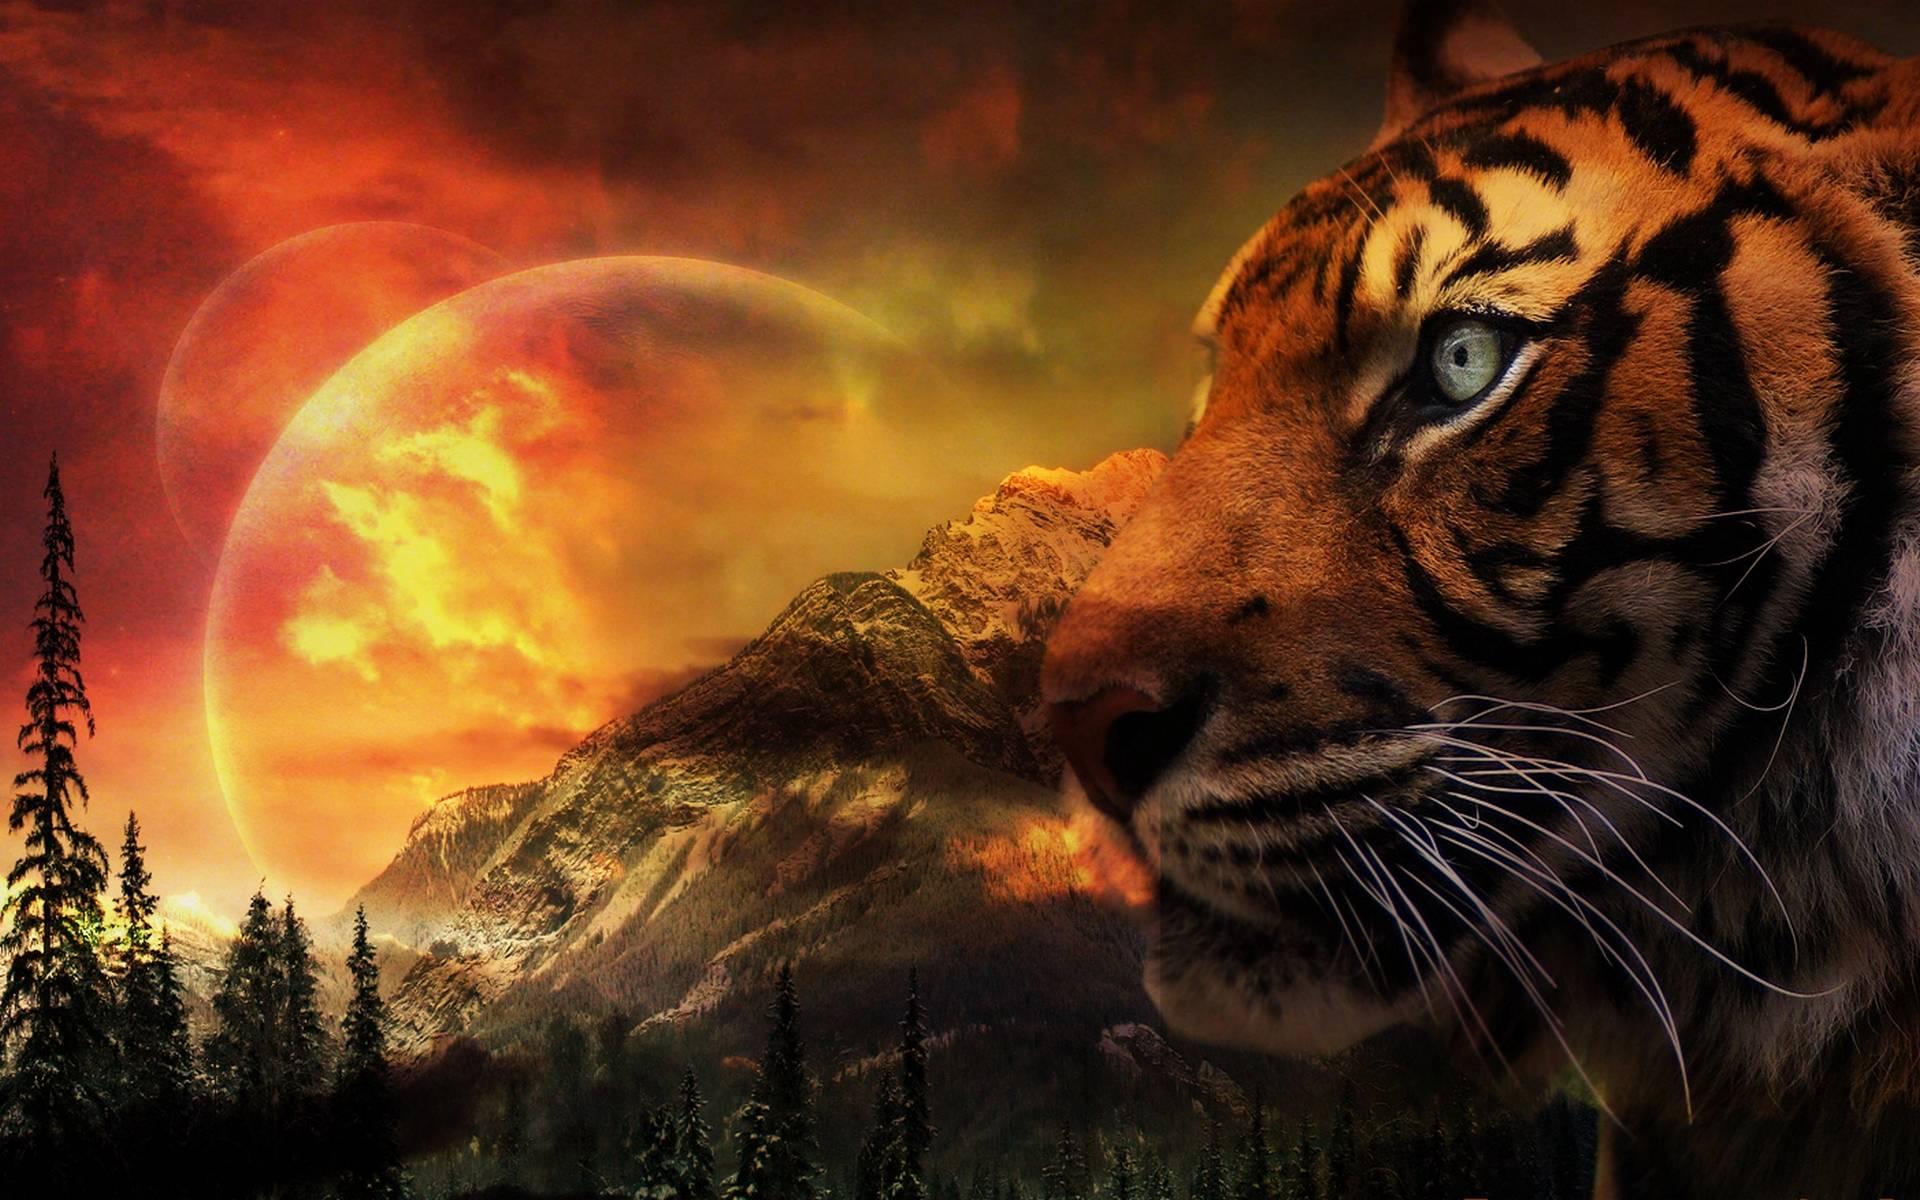 Animal Para Fondo De Pantalla: Tiger Wallpapers, Pictures, Images